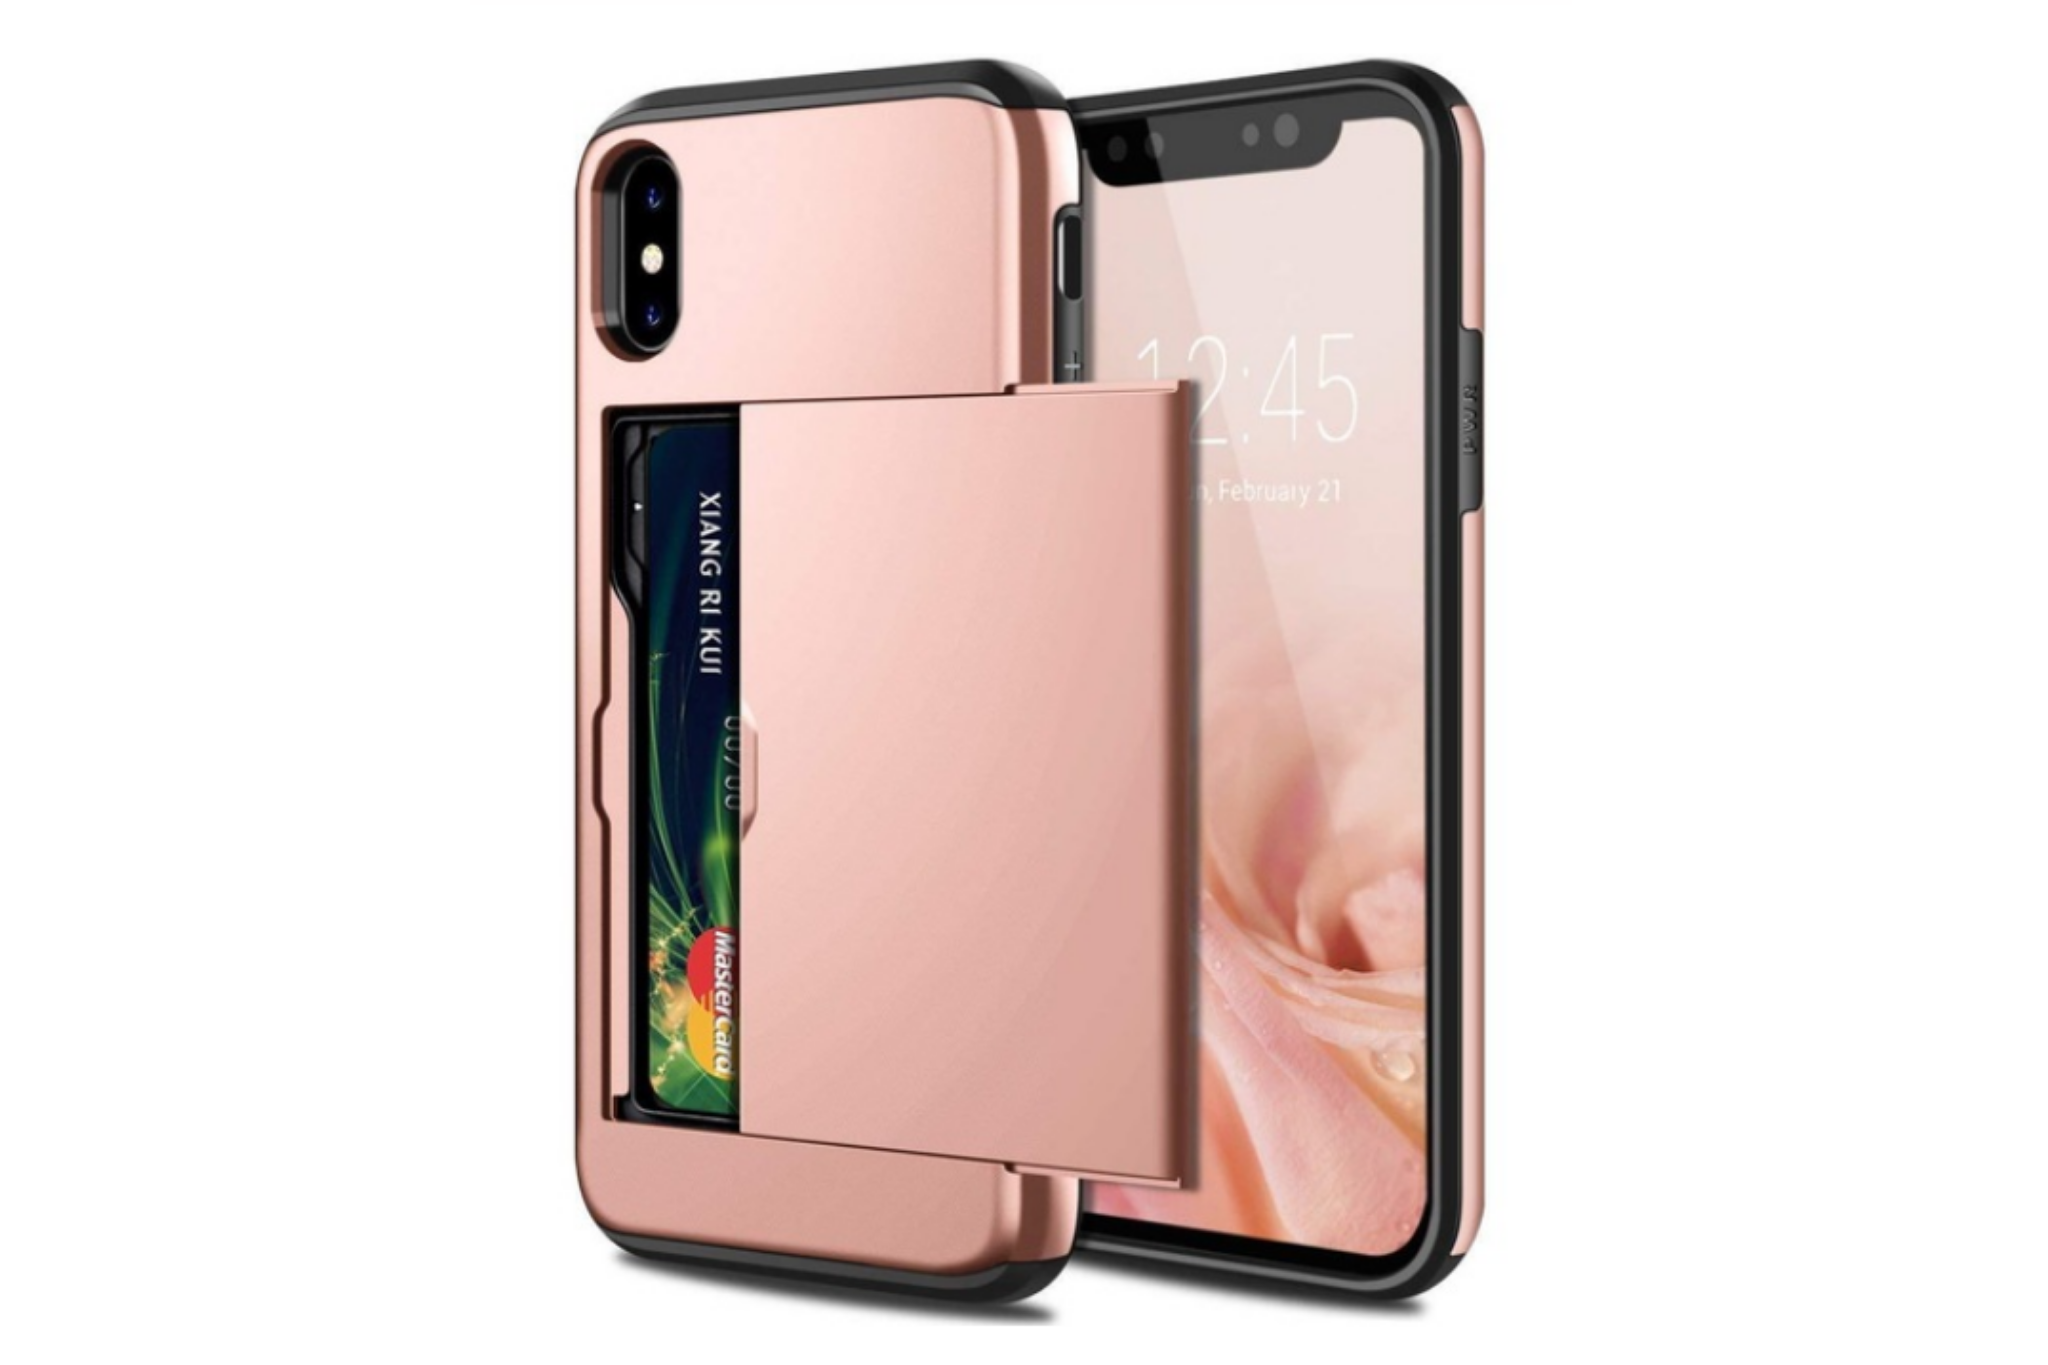 Smartphonehoesje iPhone 12 mini | Pasjesschuif | Rose gold